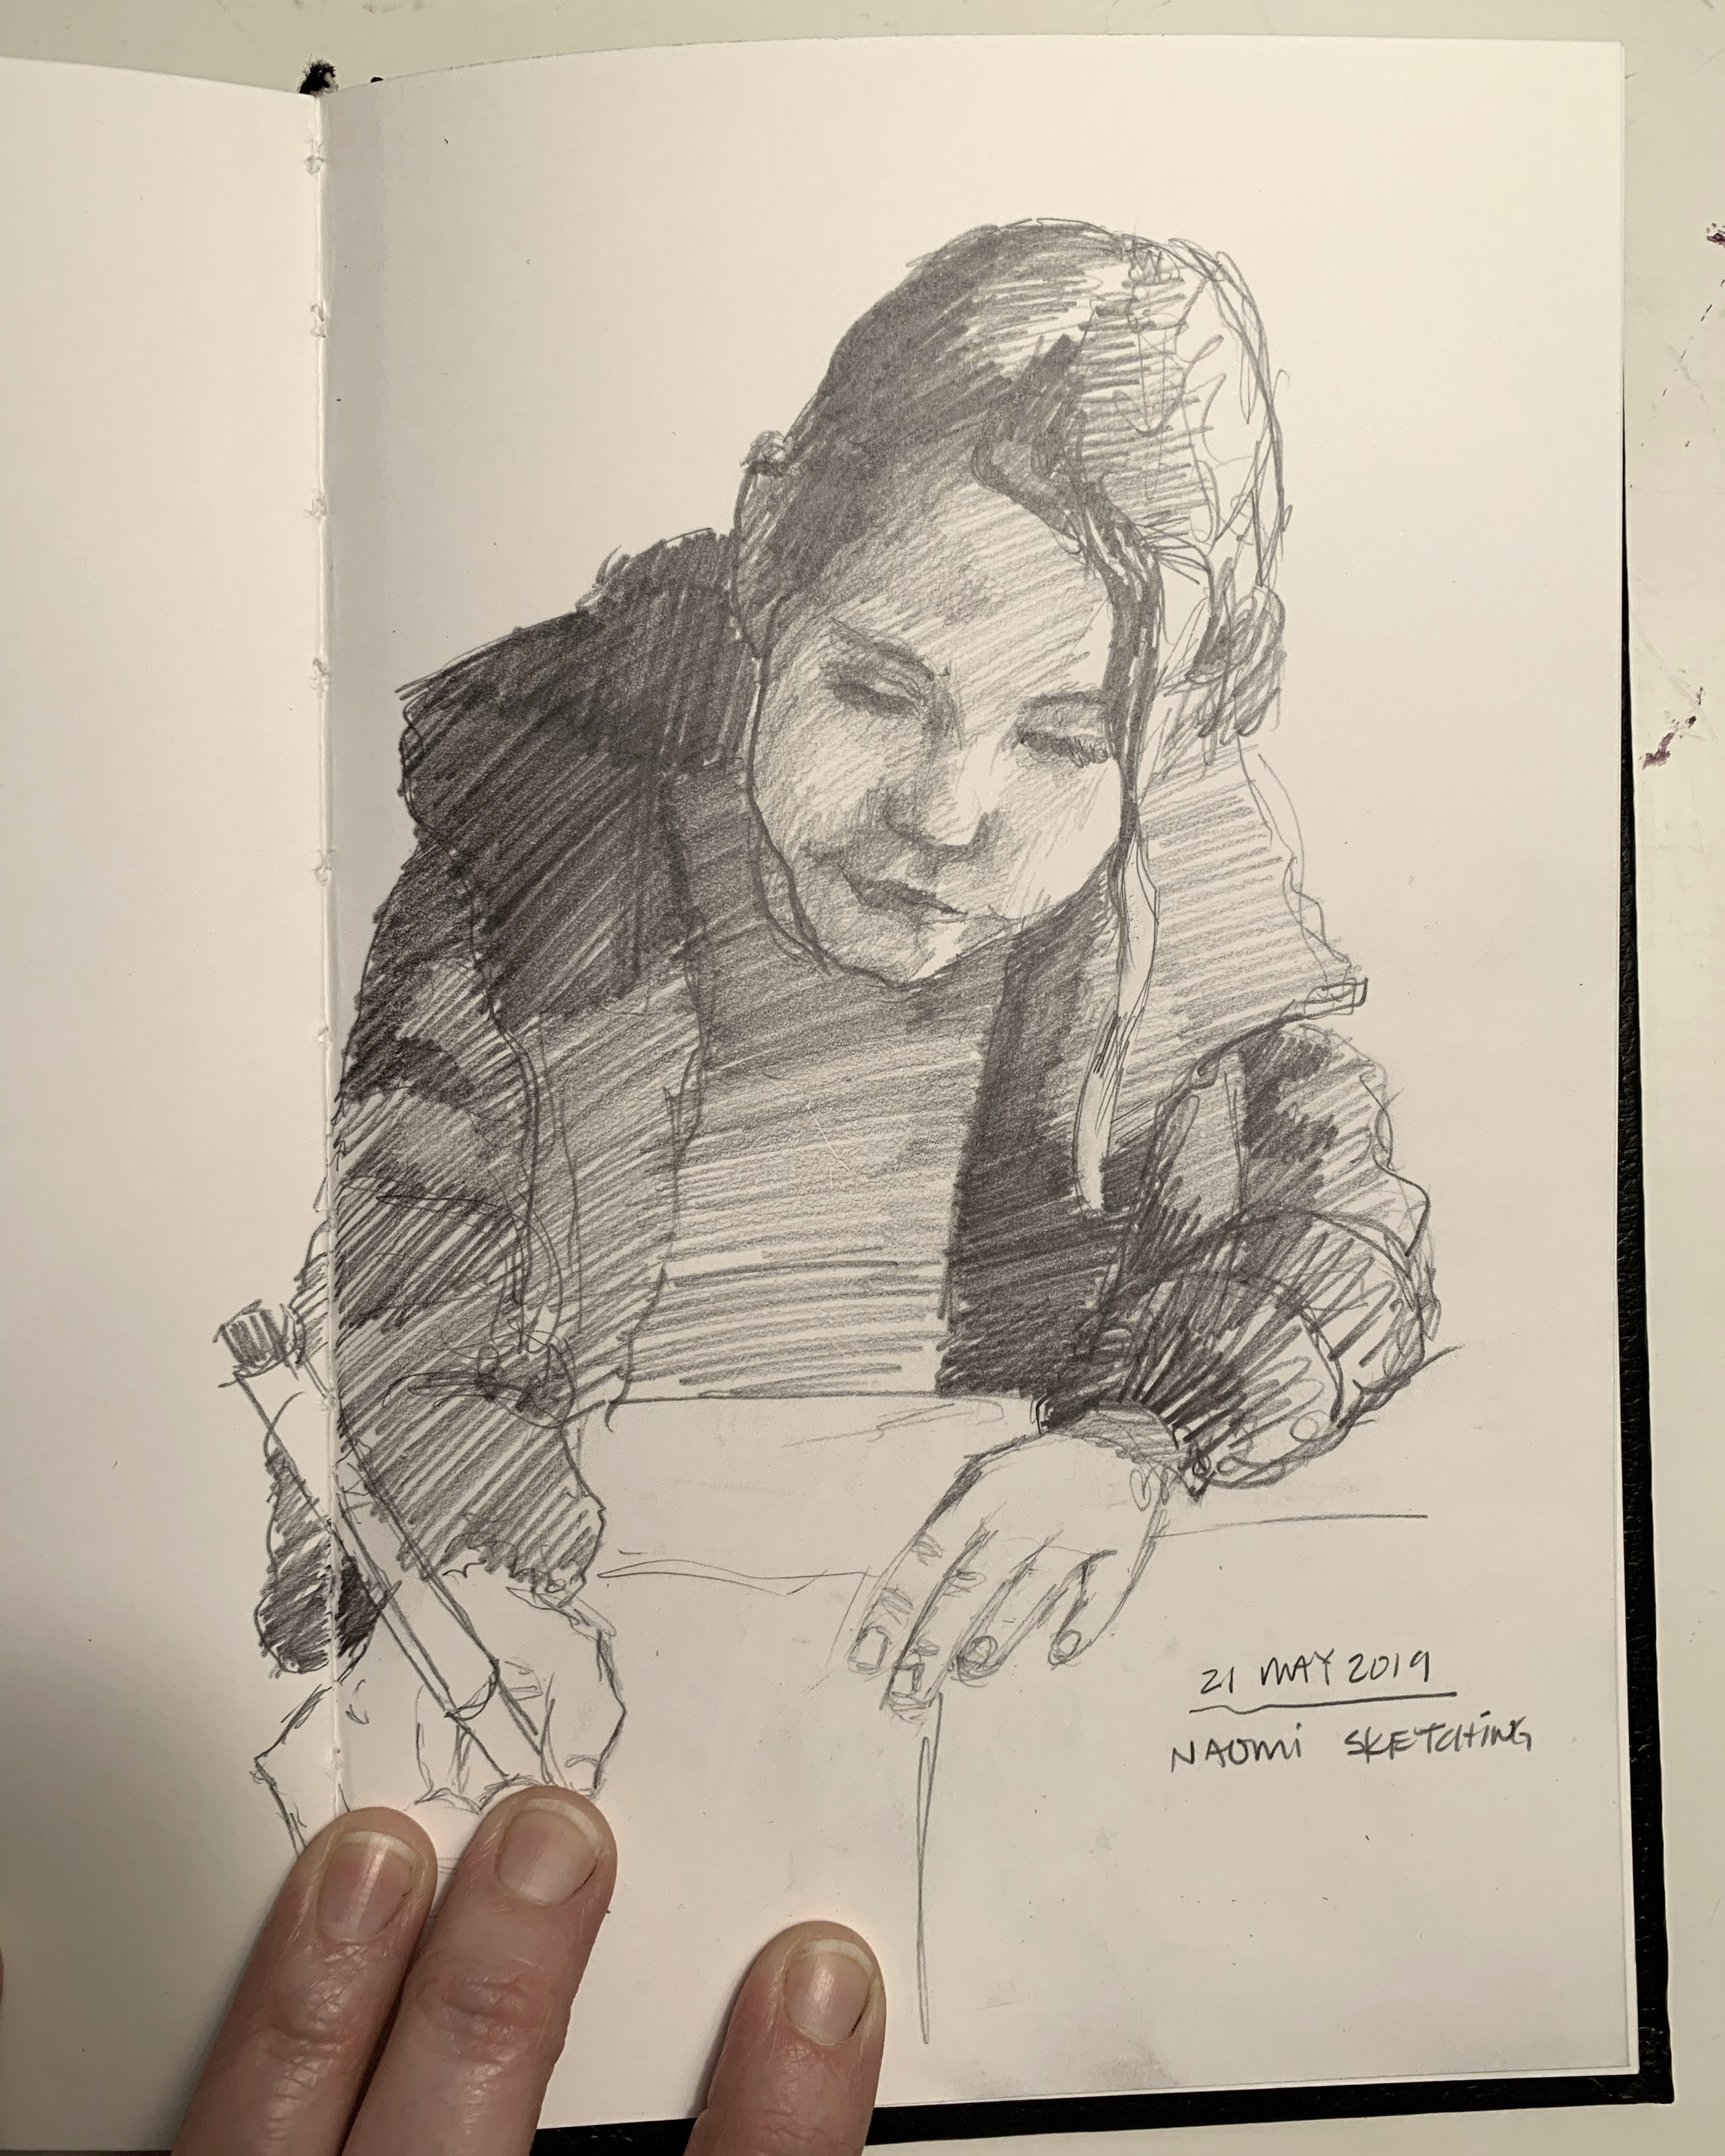 Day 141: Sketch of Naomi drawing